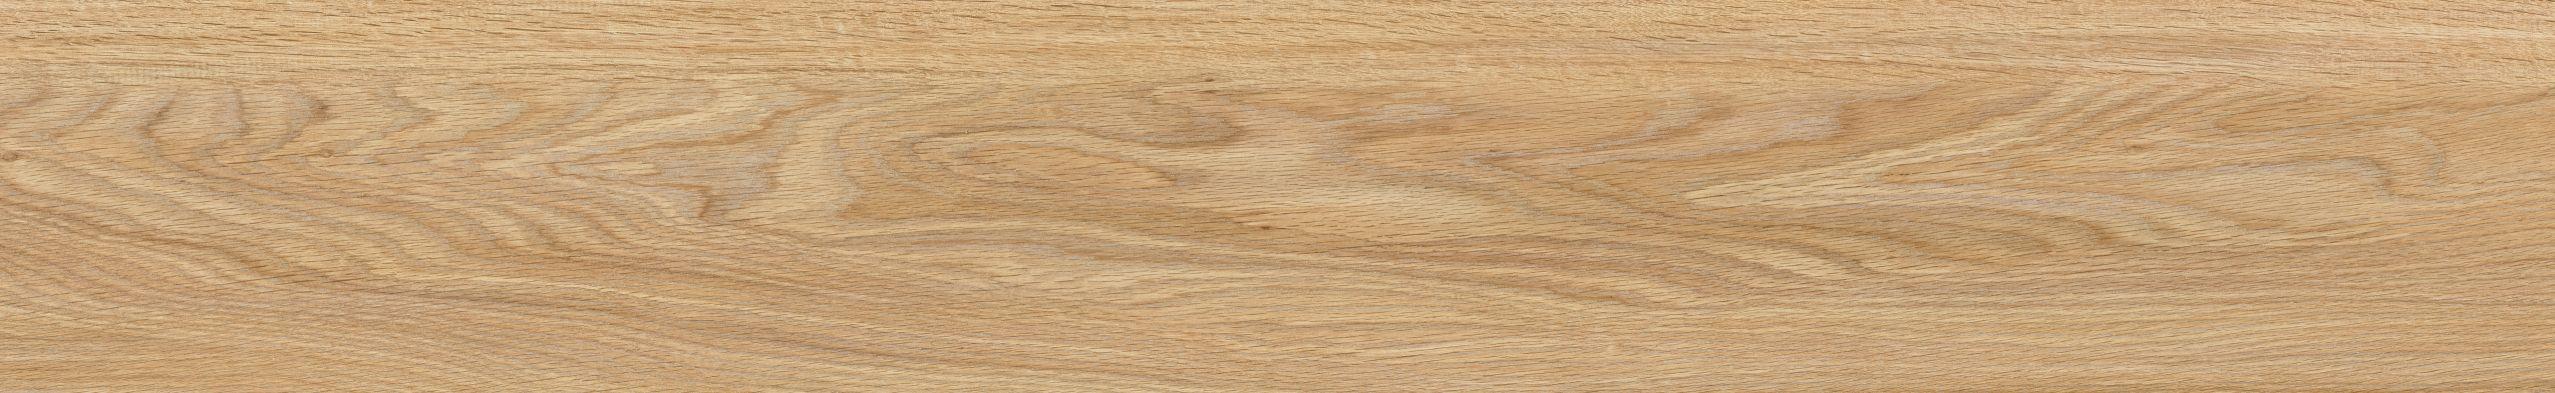 Panele winylowe LVT modulari ® WOOD DRYBACK 19,6 x 132 cm 24247